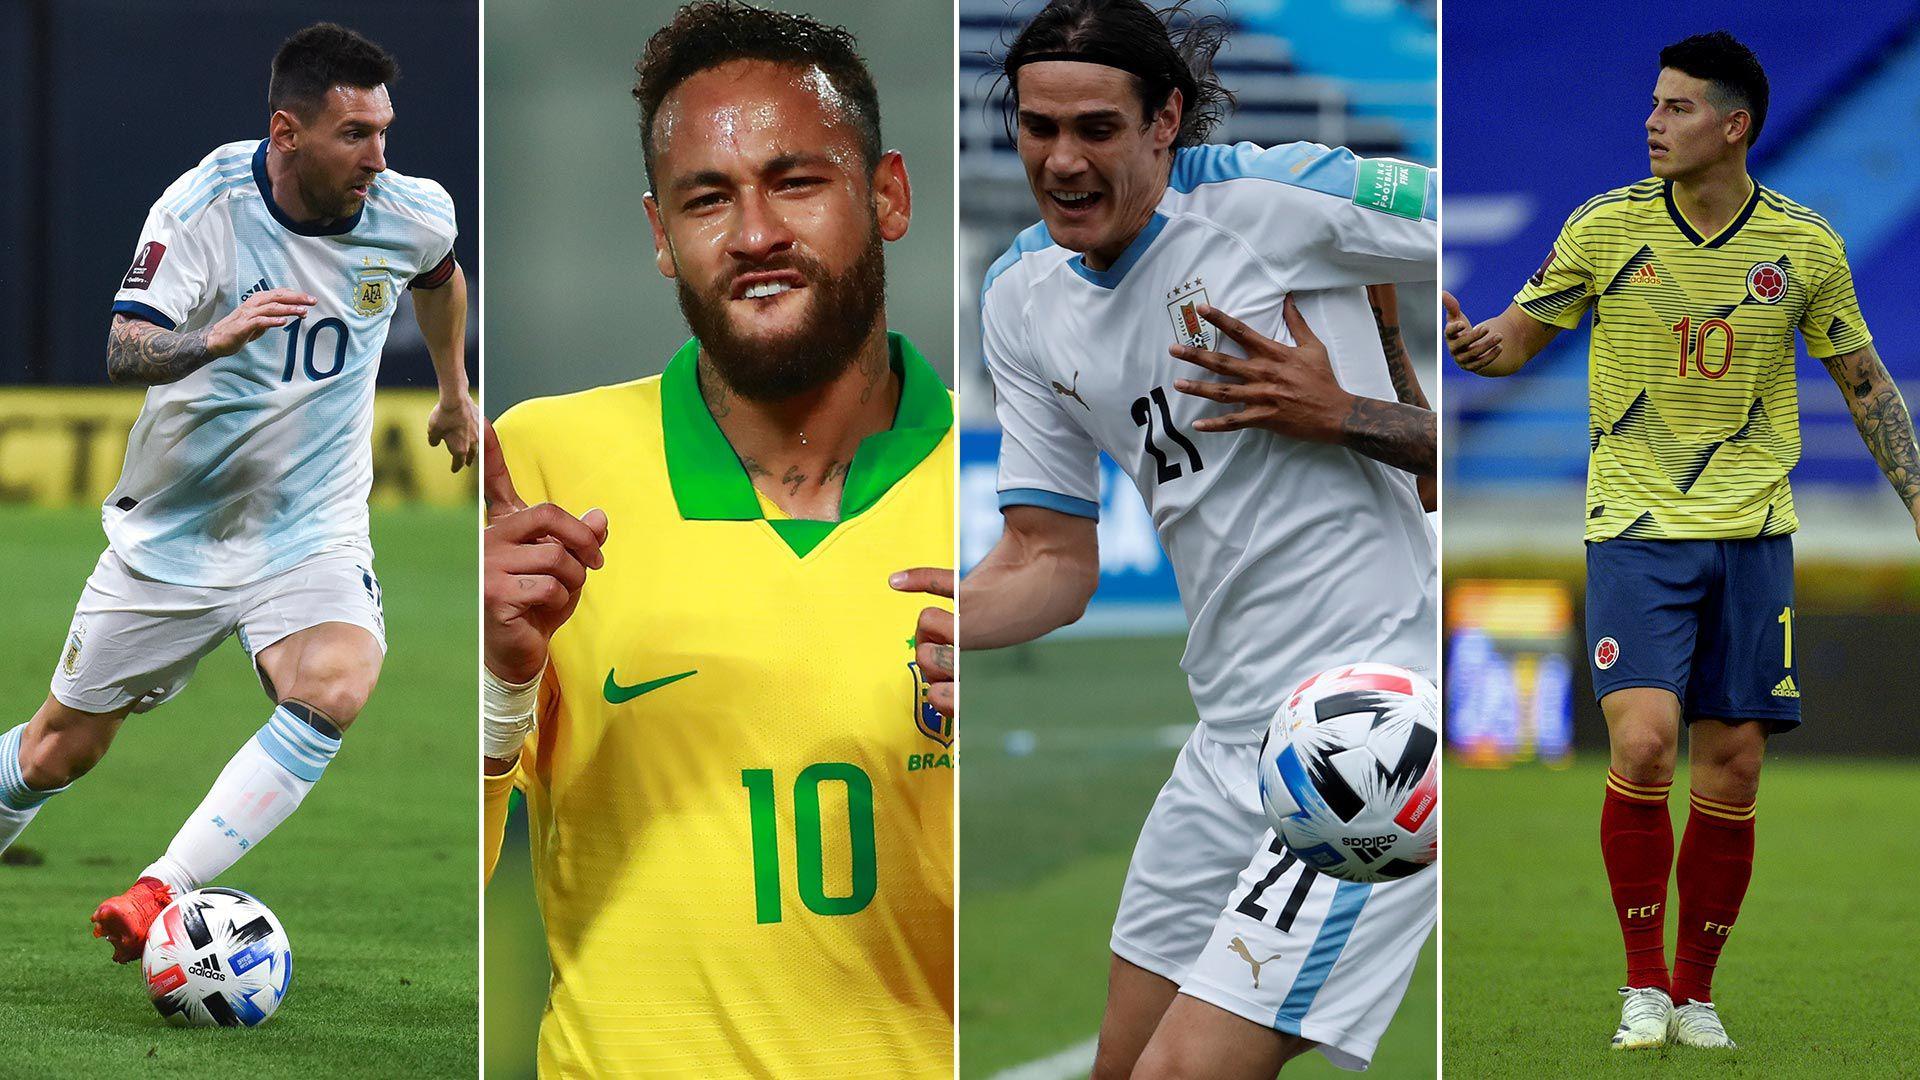 Messi argentina - Neymar Brasil - Cavani Uruguay - James Colombia 1920